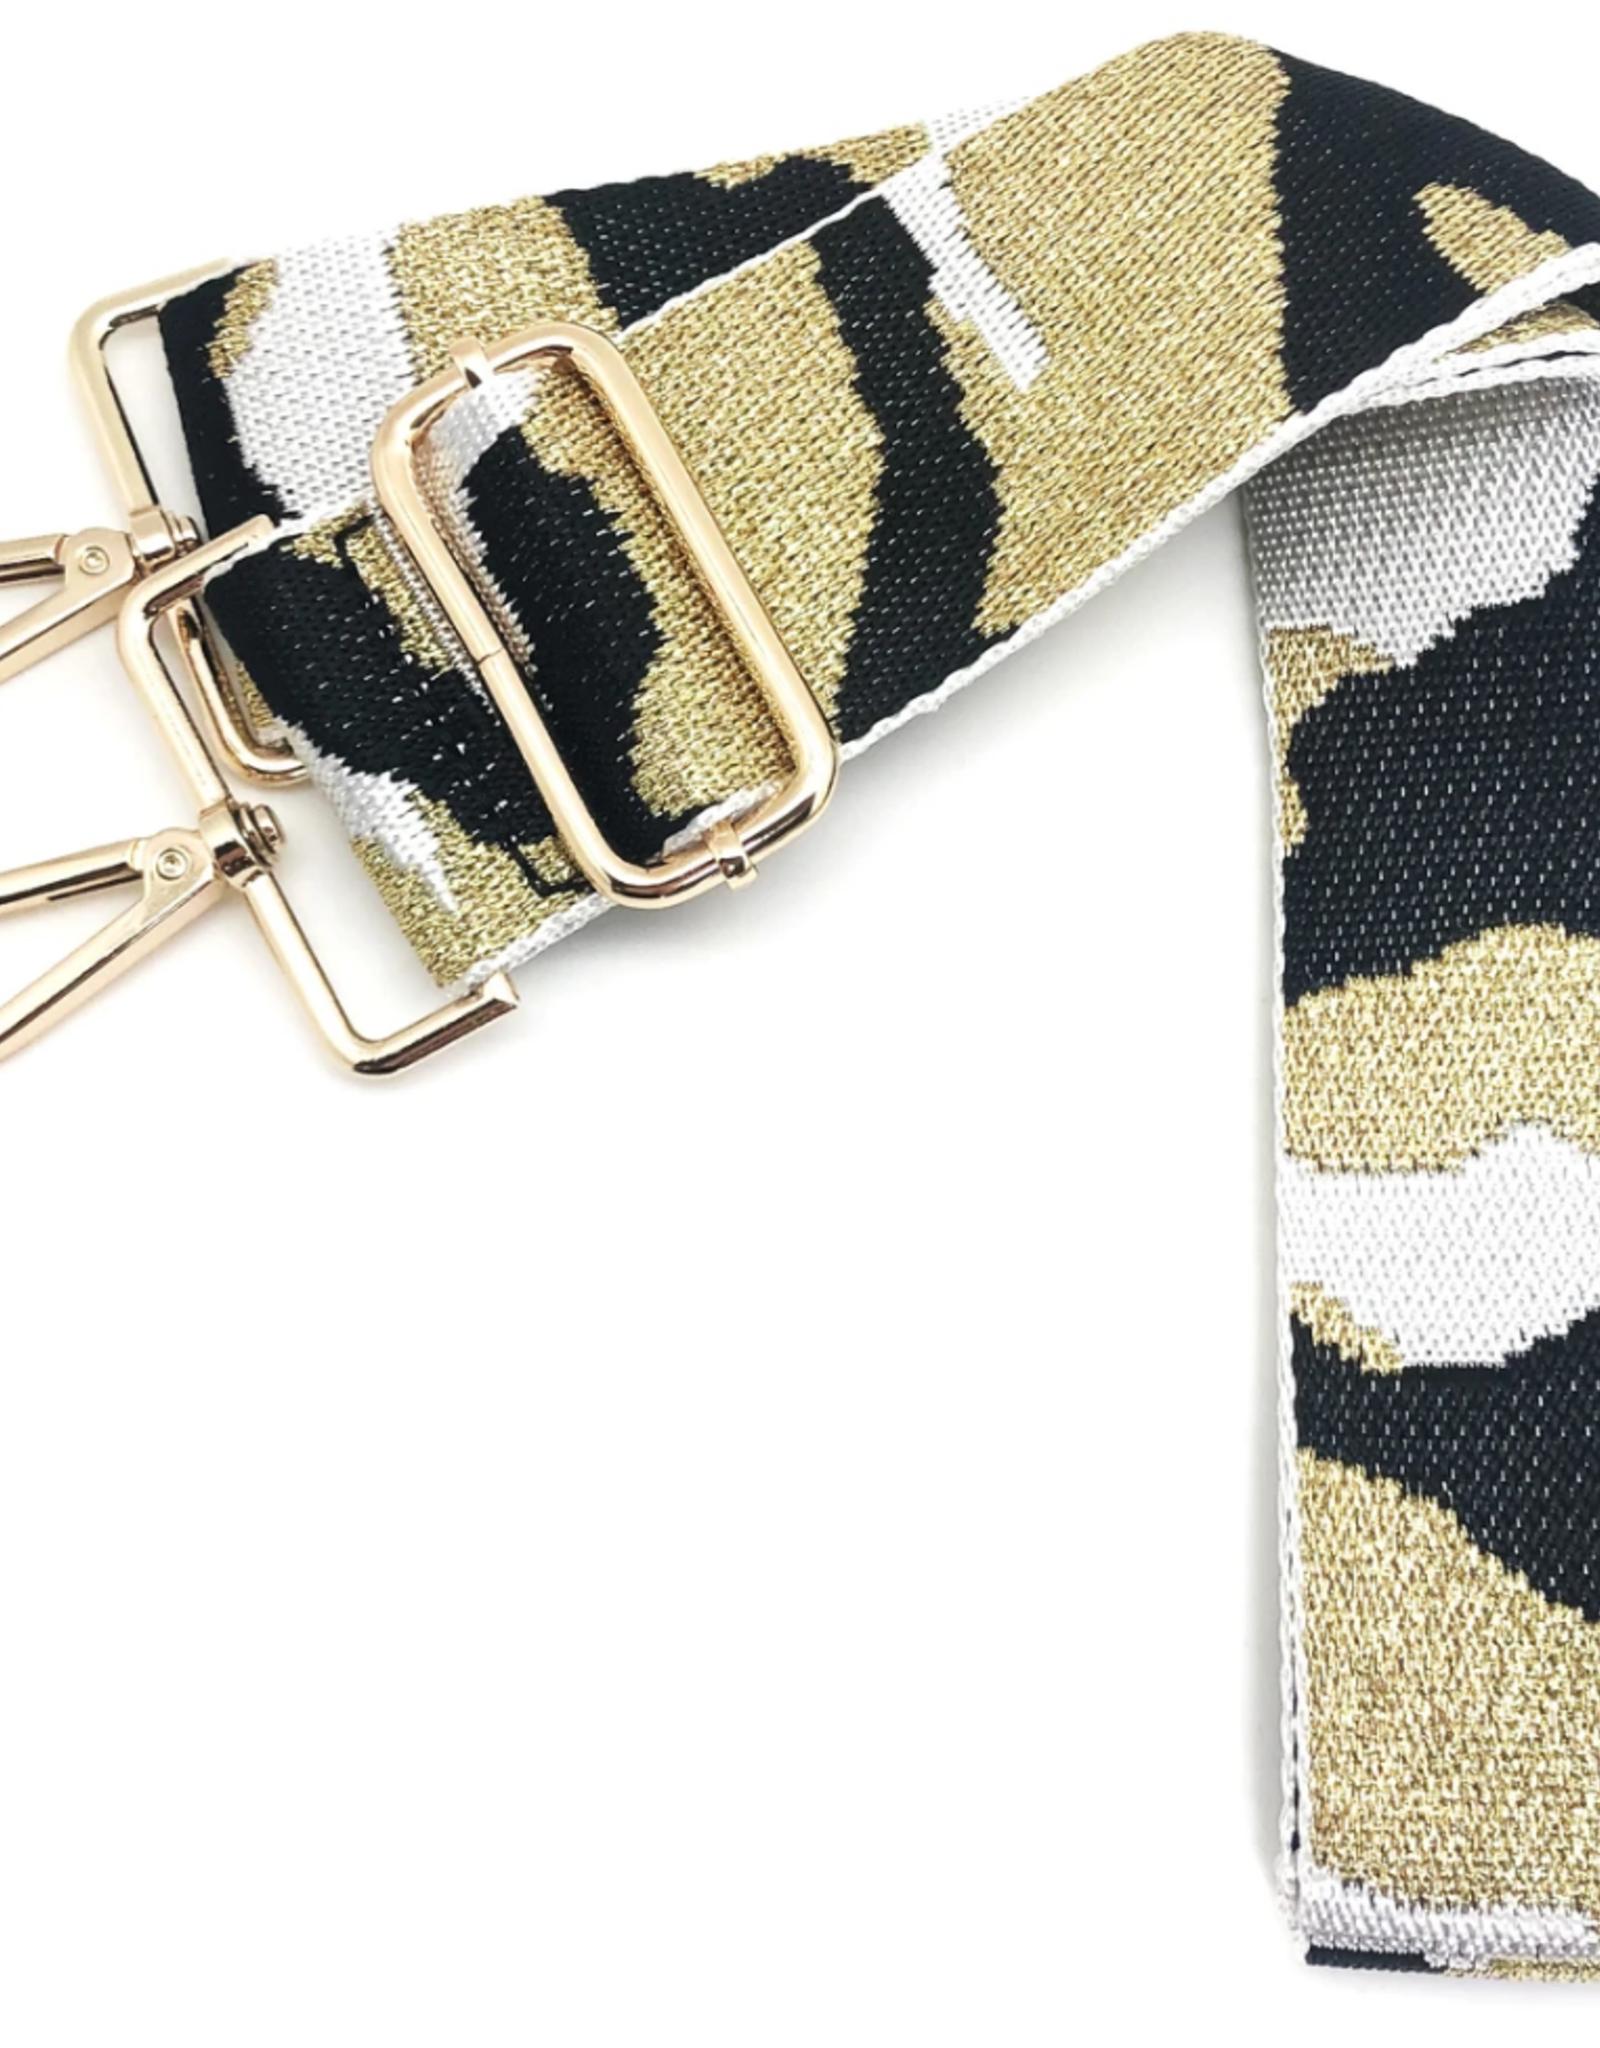 CTHRUPURSES Canvas Camo in  White & Metallic Gold  Strap Gold Buckle